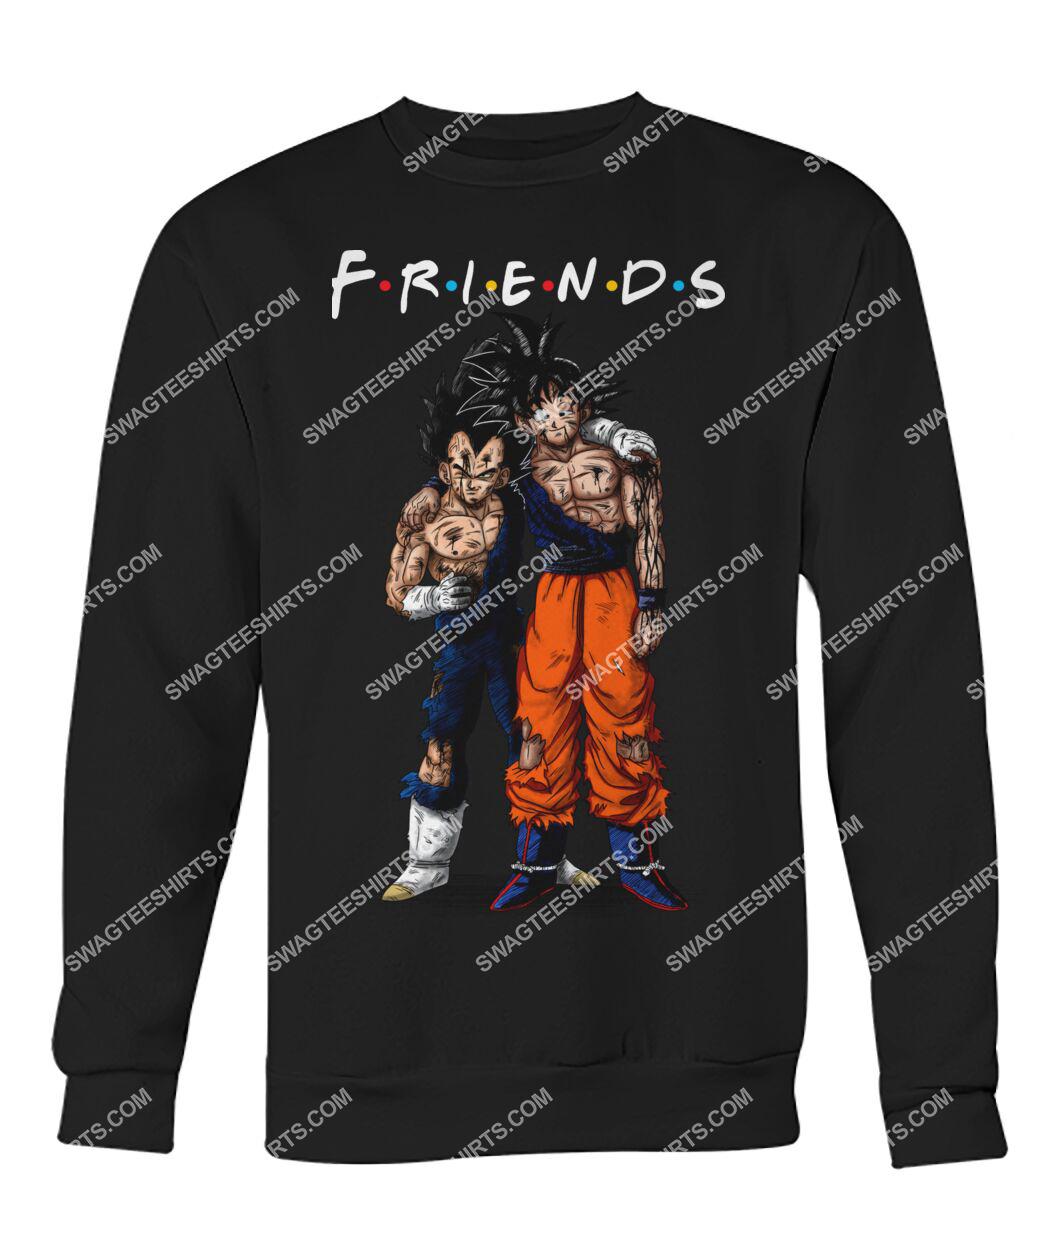 dragon ball z goku and vegeta friends tv show sweatshirt 1